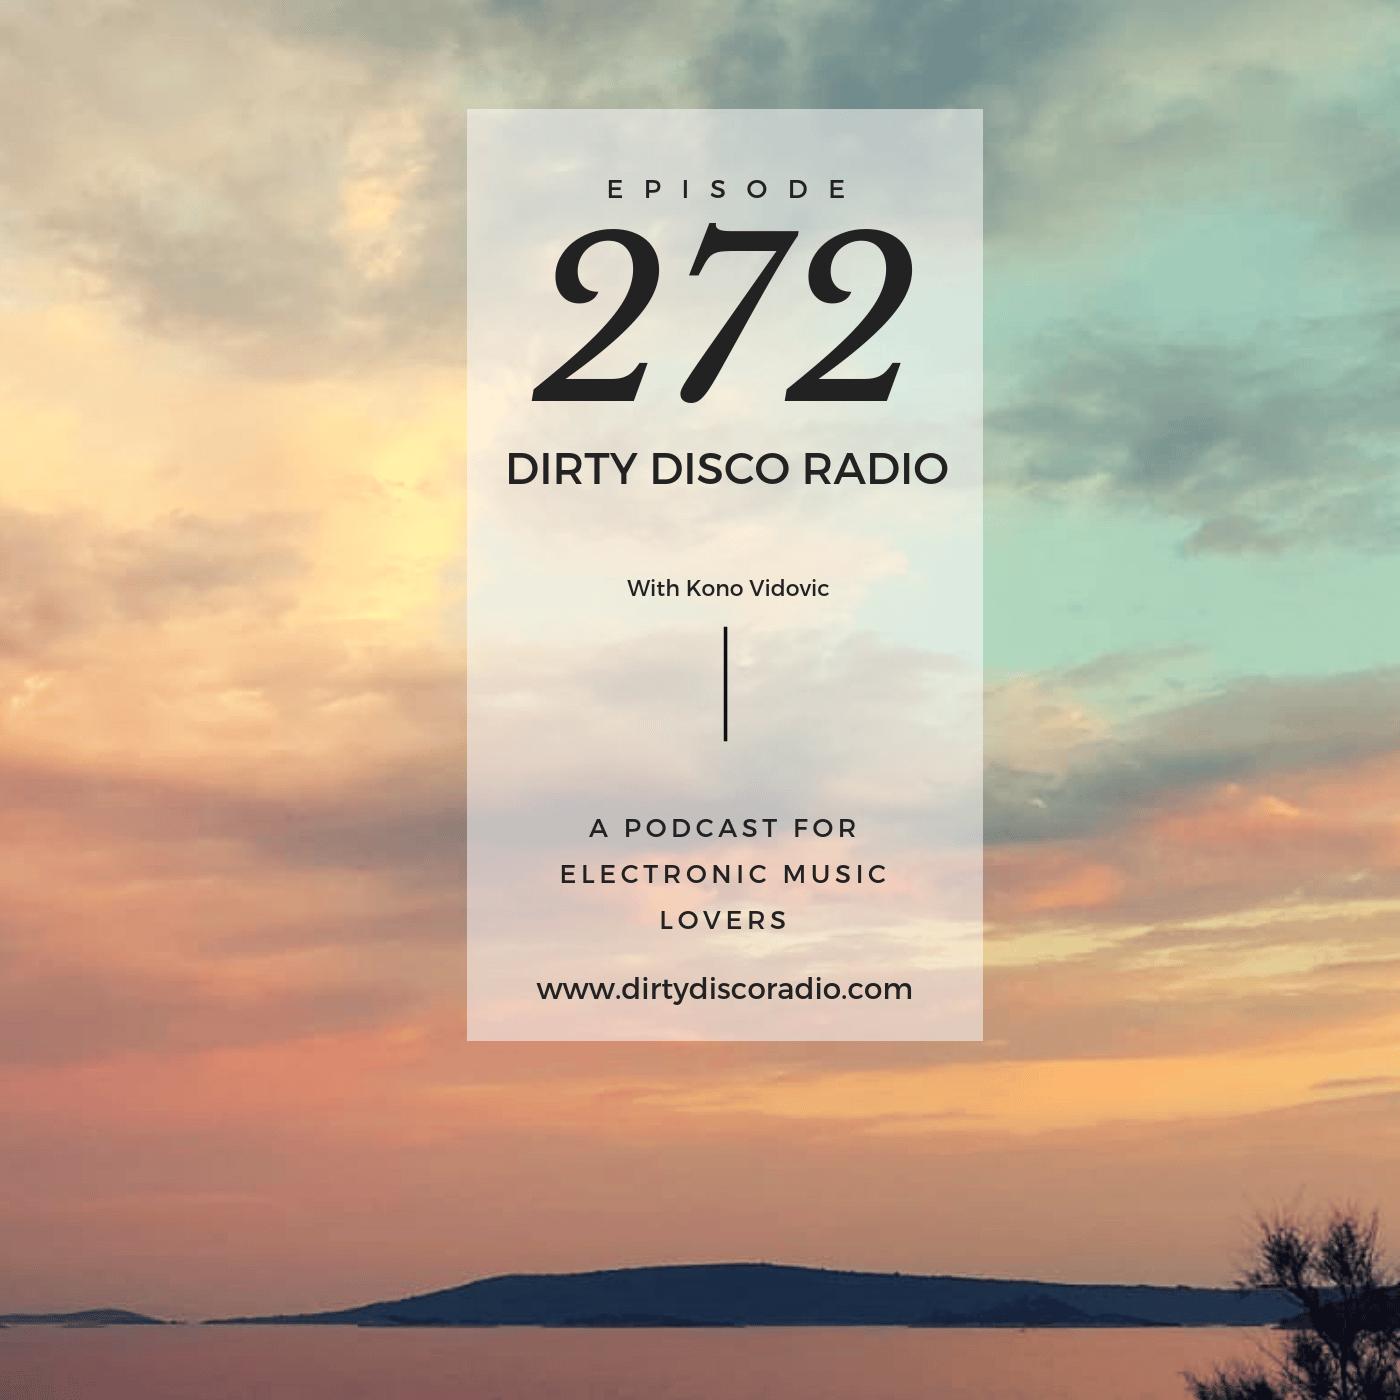 Deep in the house - Dirty Disco Radio 272